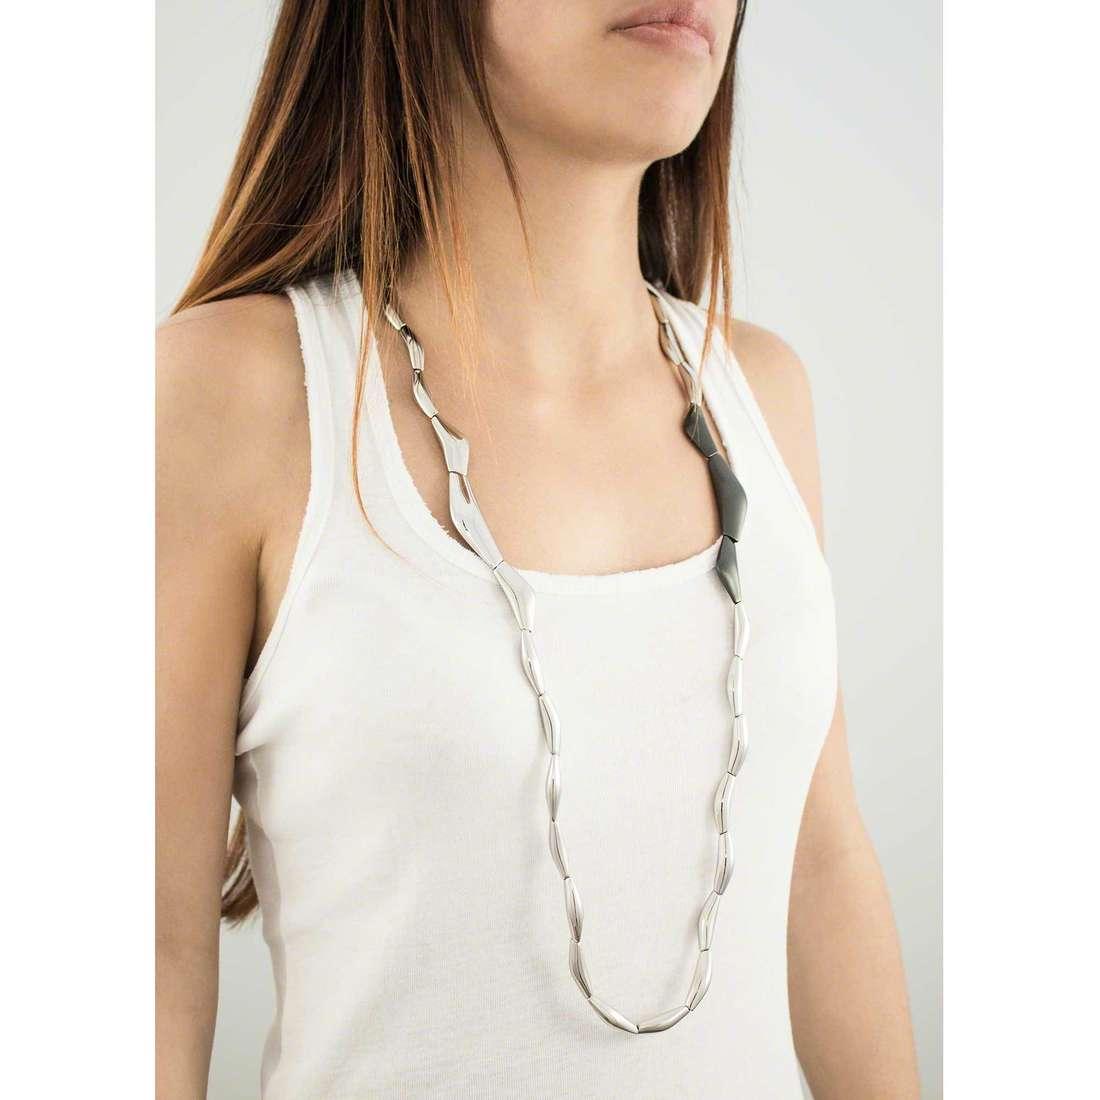 Breil colliers Flowing femme TJ1819 indosso